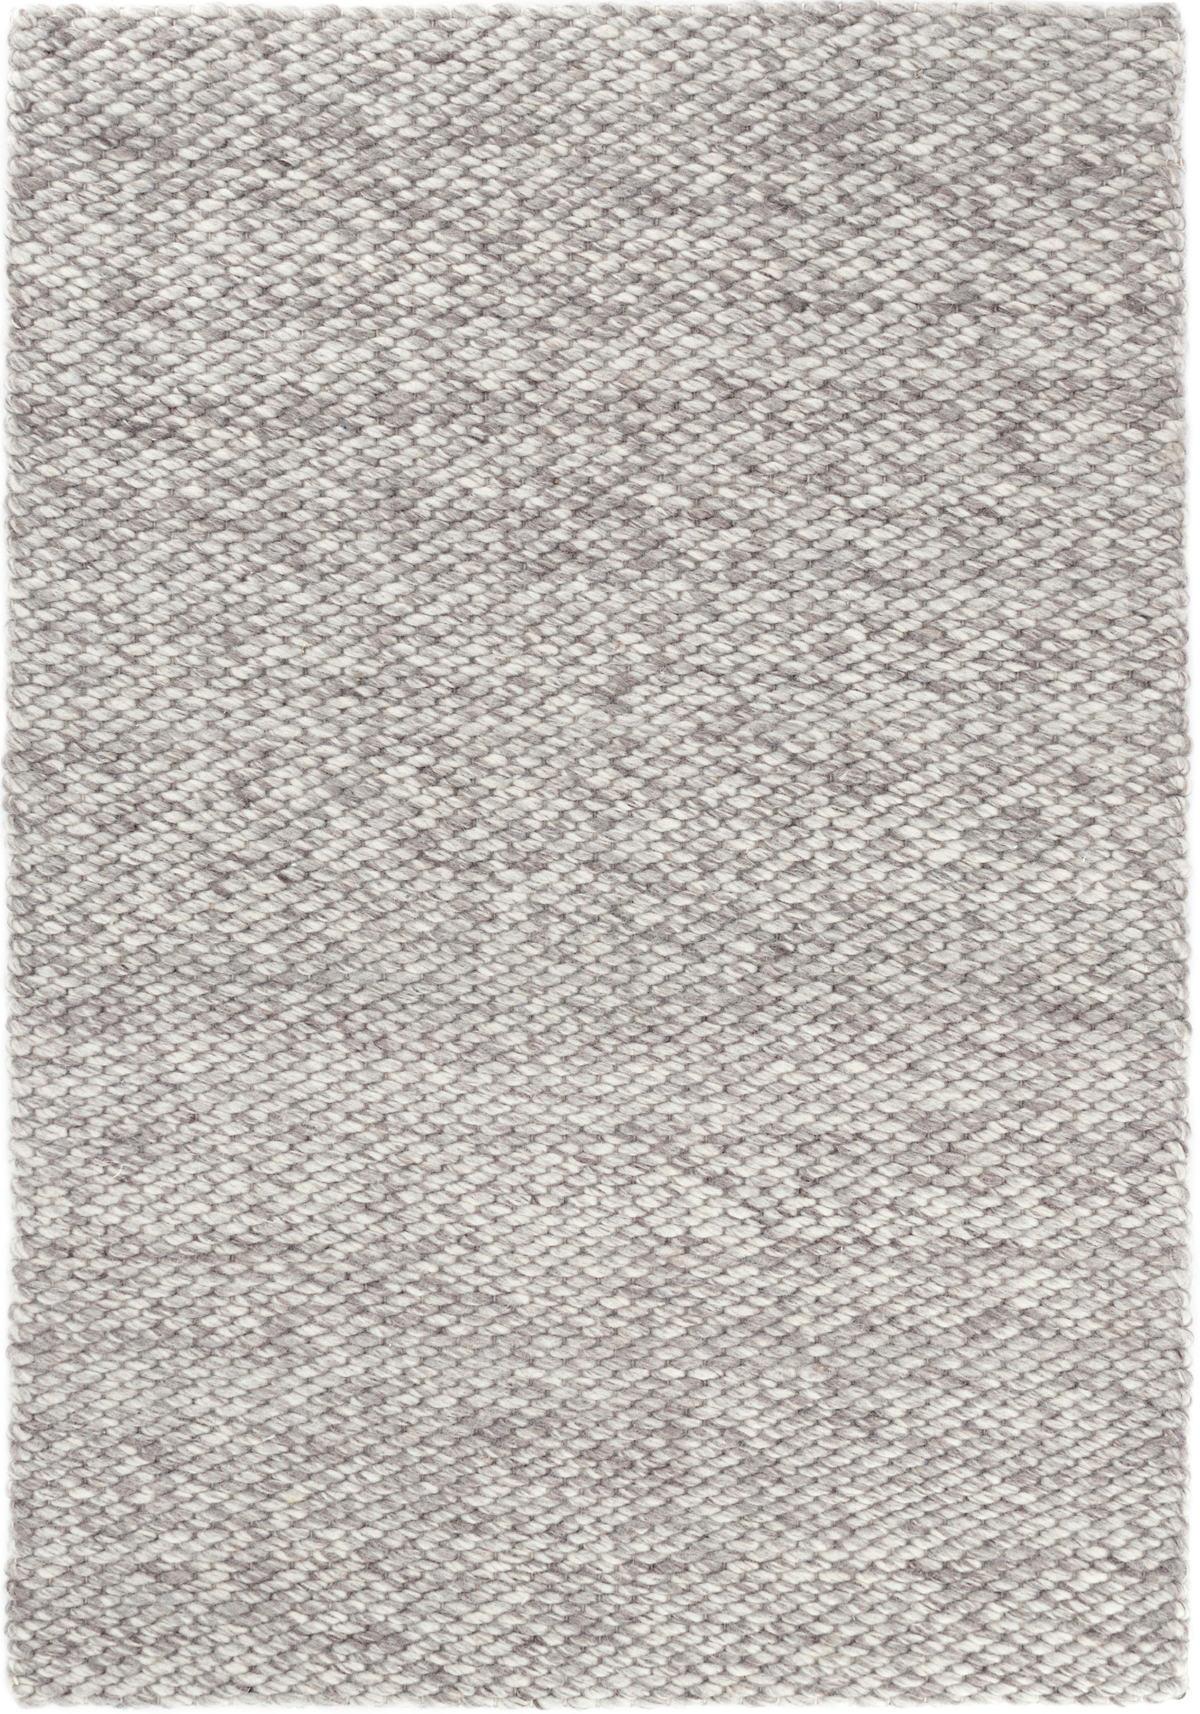 Loggia Grey Woven Wool Rug